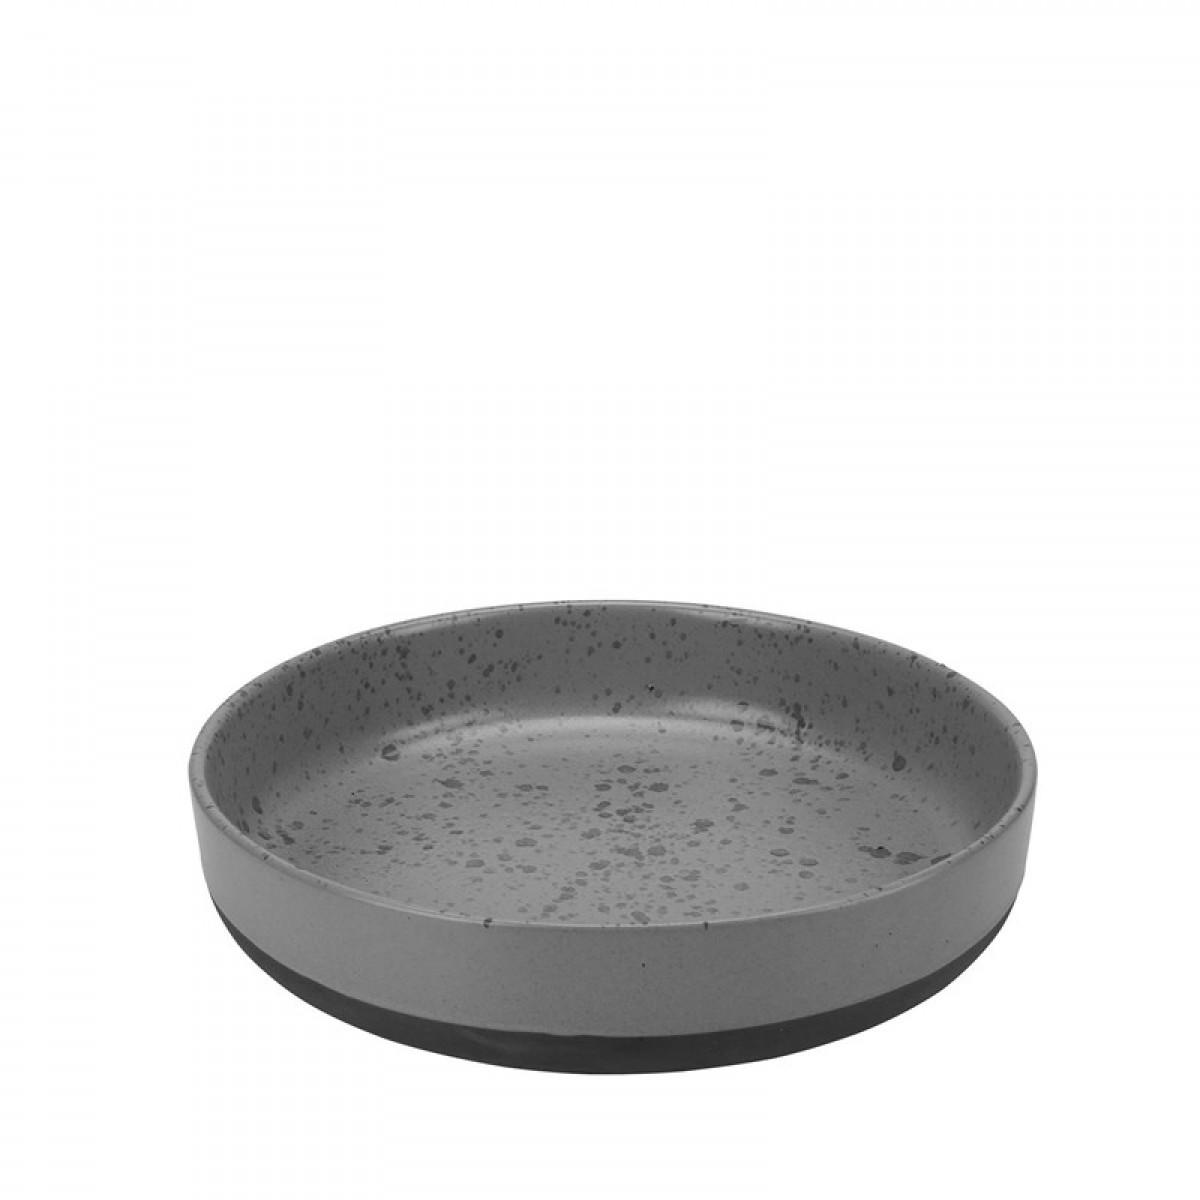 AIDA Raw serveringsskål grå plettet 30cm